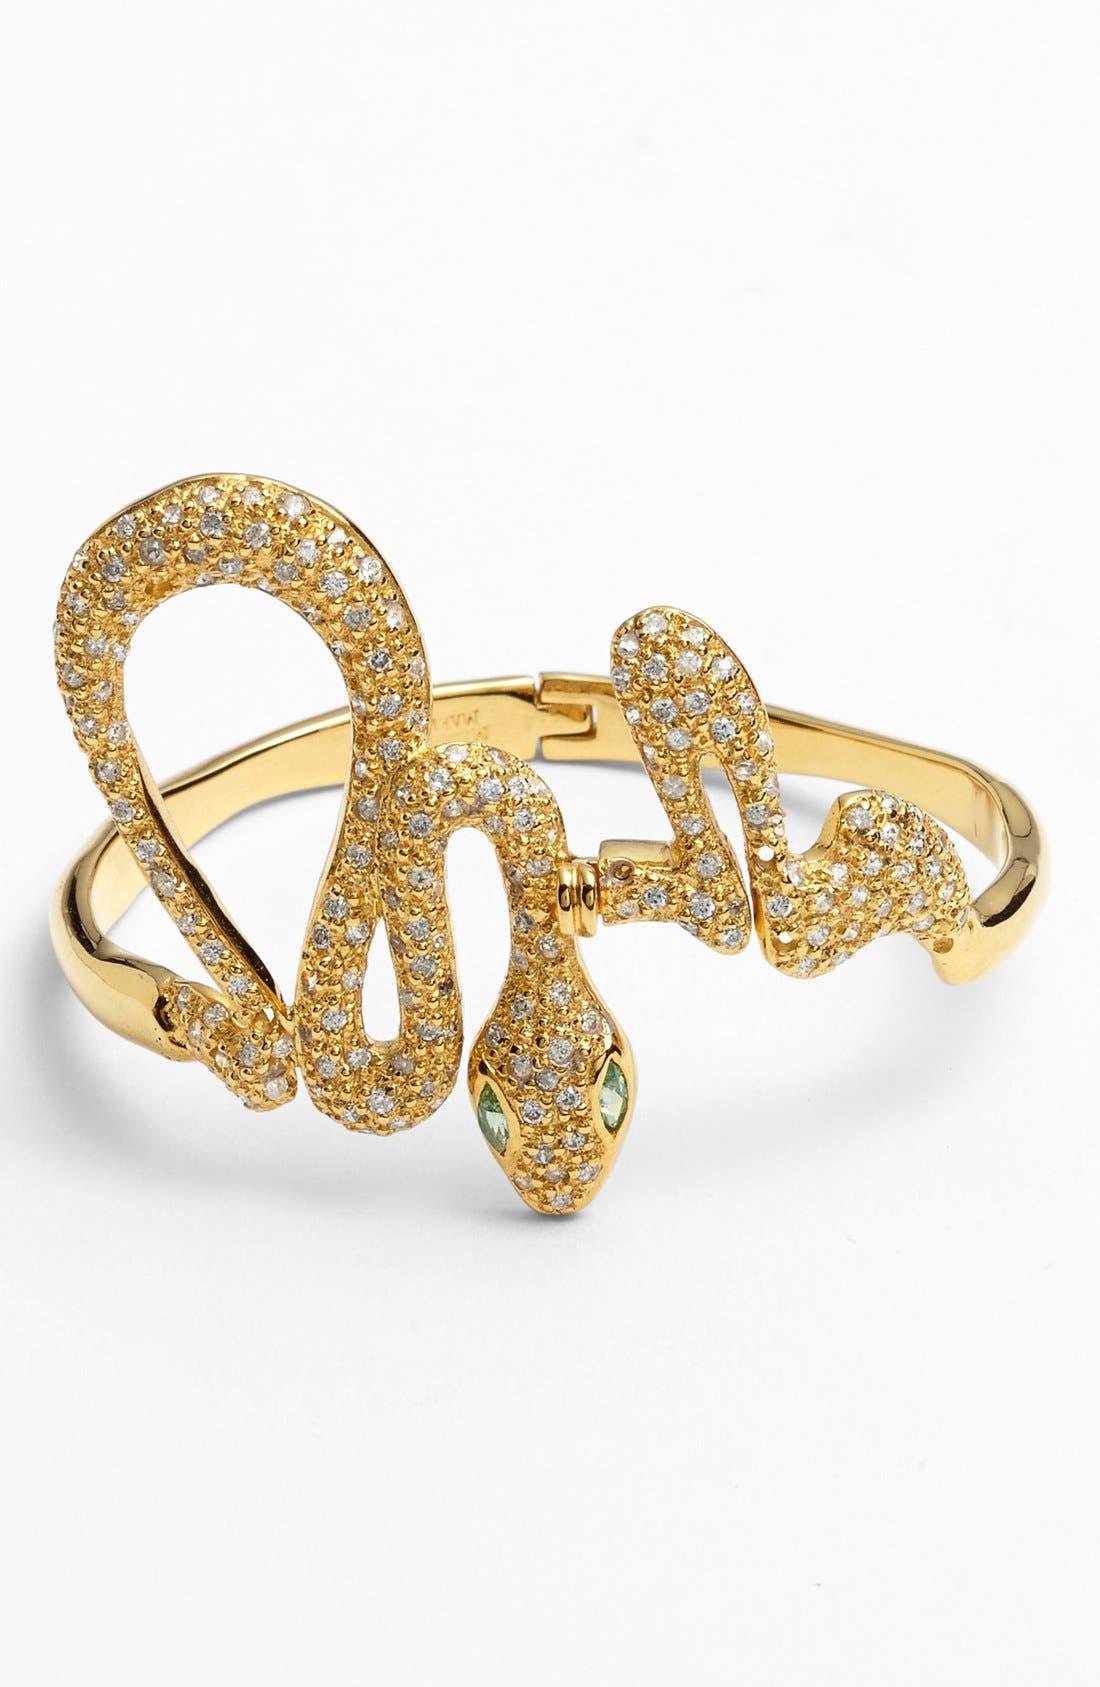 Main Image - Melinda Maria 'Serpent' Hinged Bracelet (Online Only)